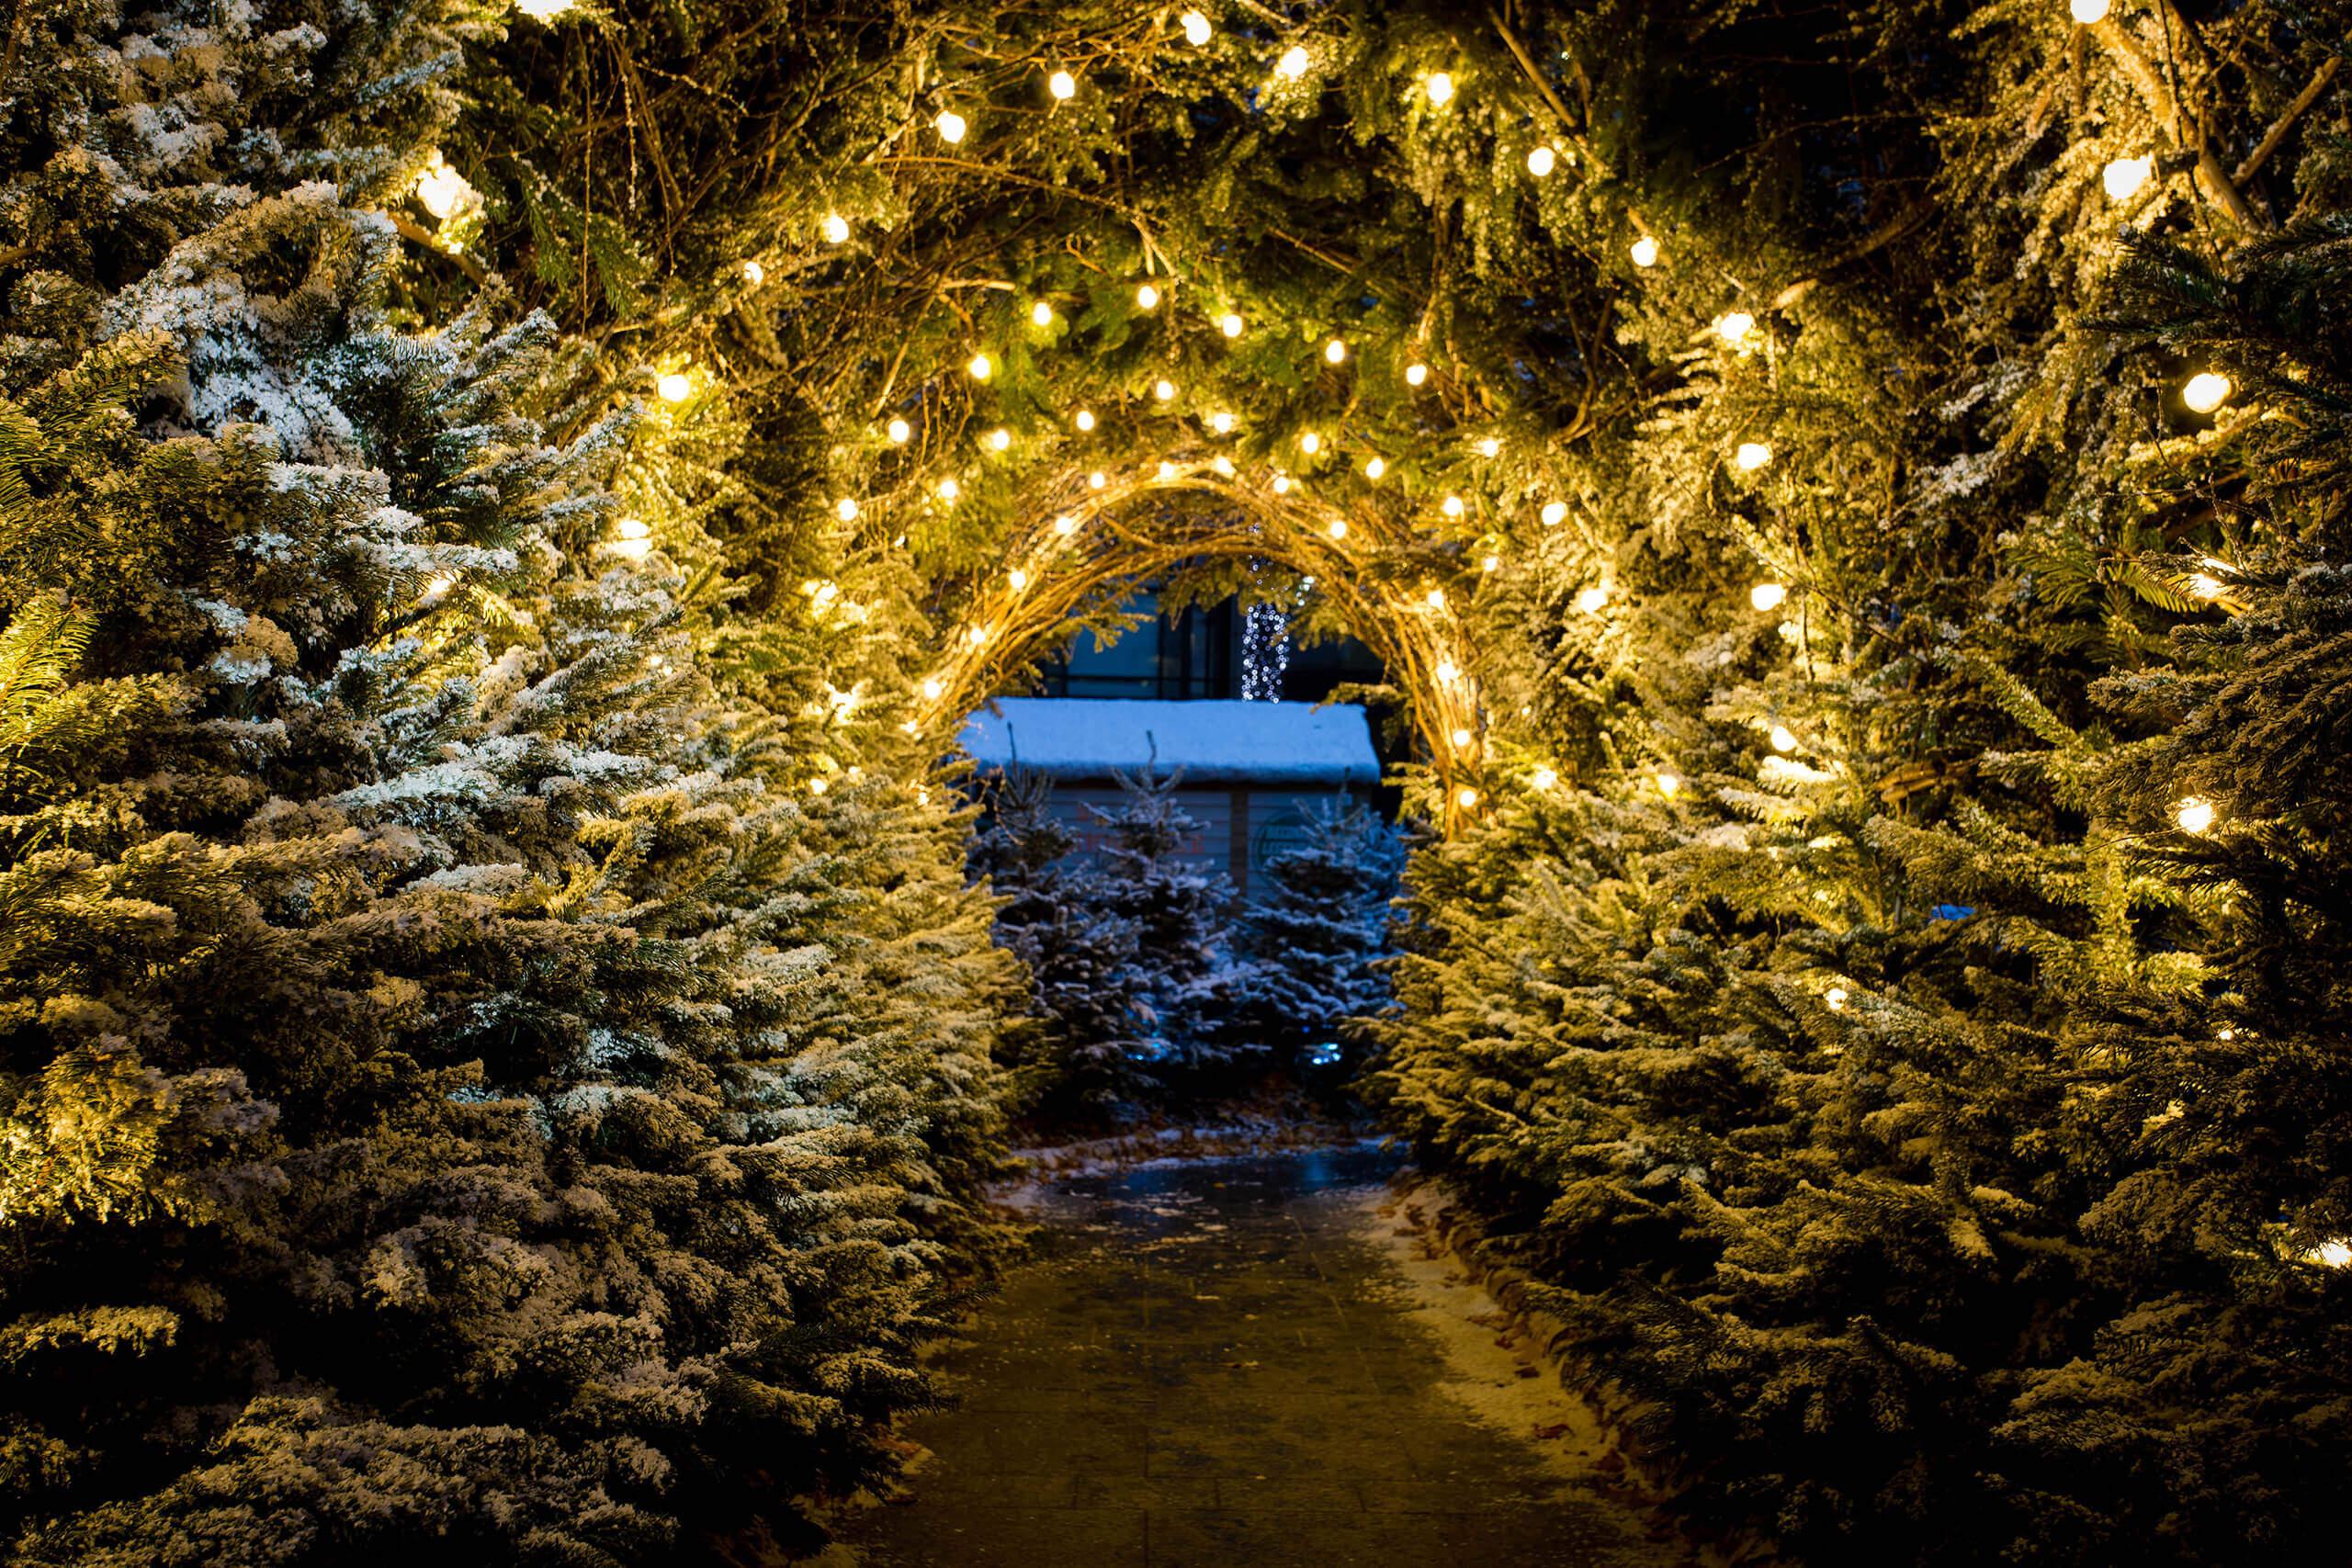 Broadgate-Winter-Forest-119